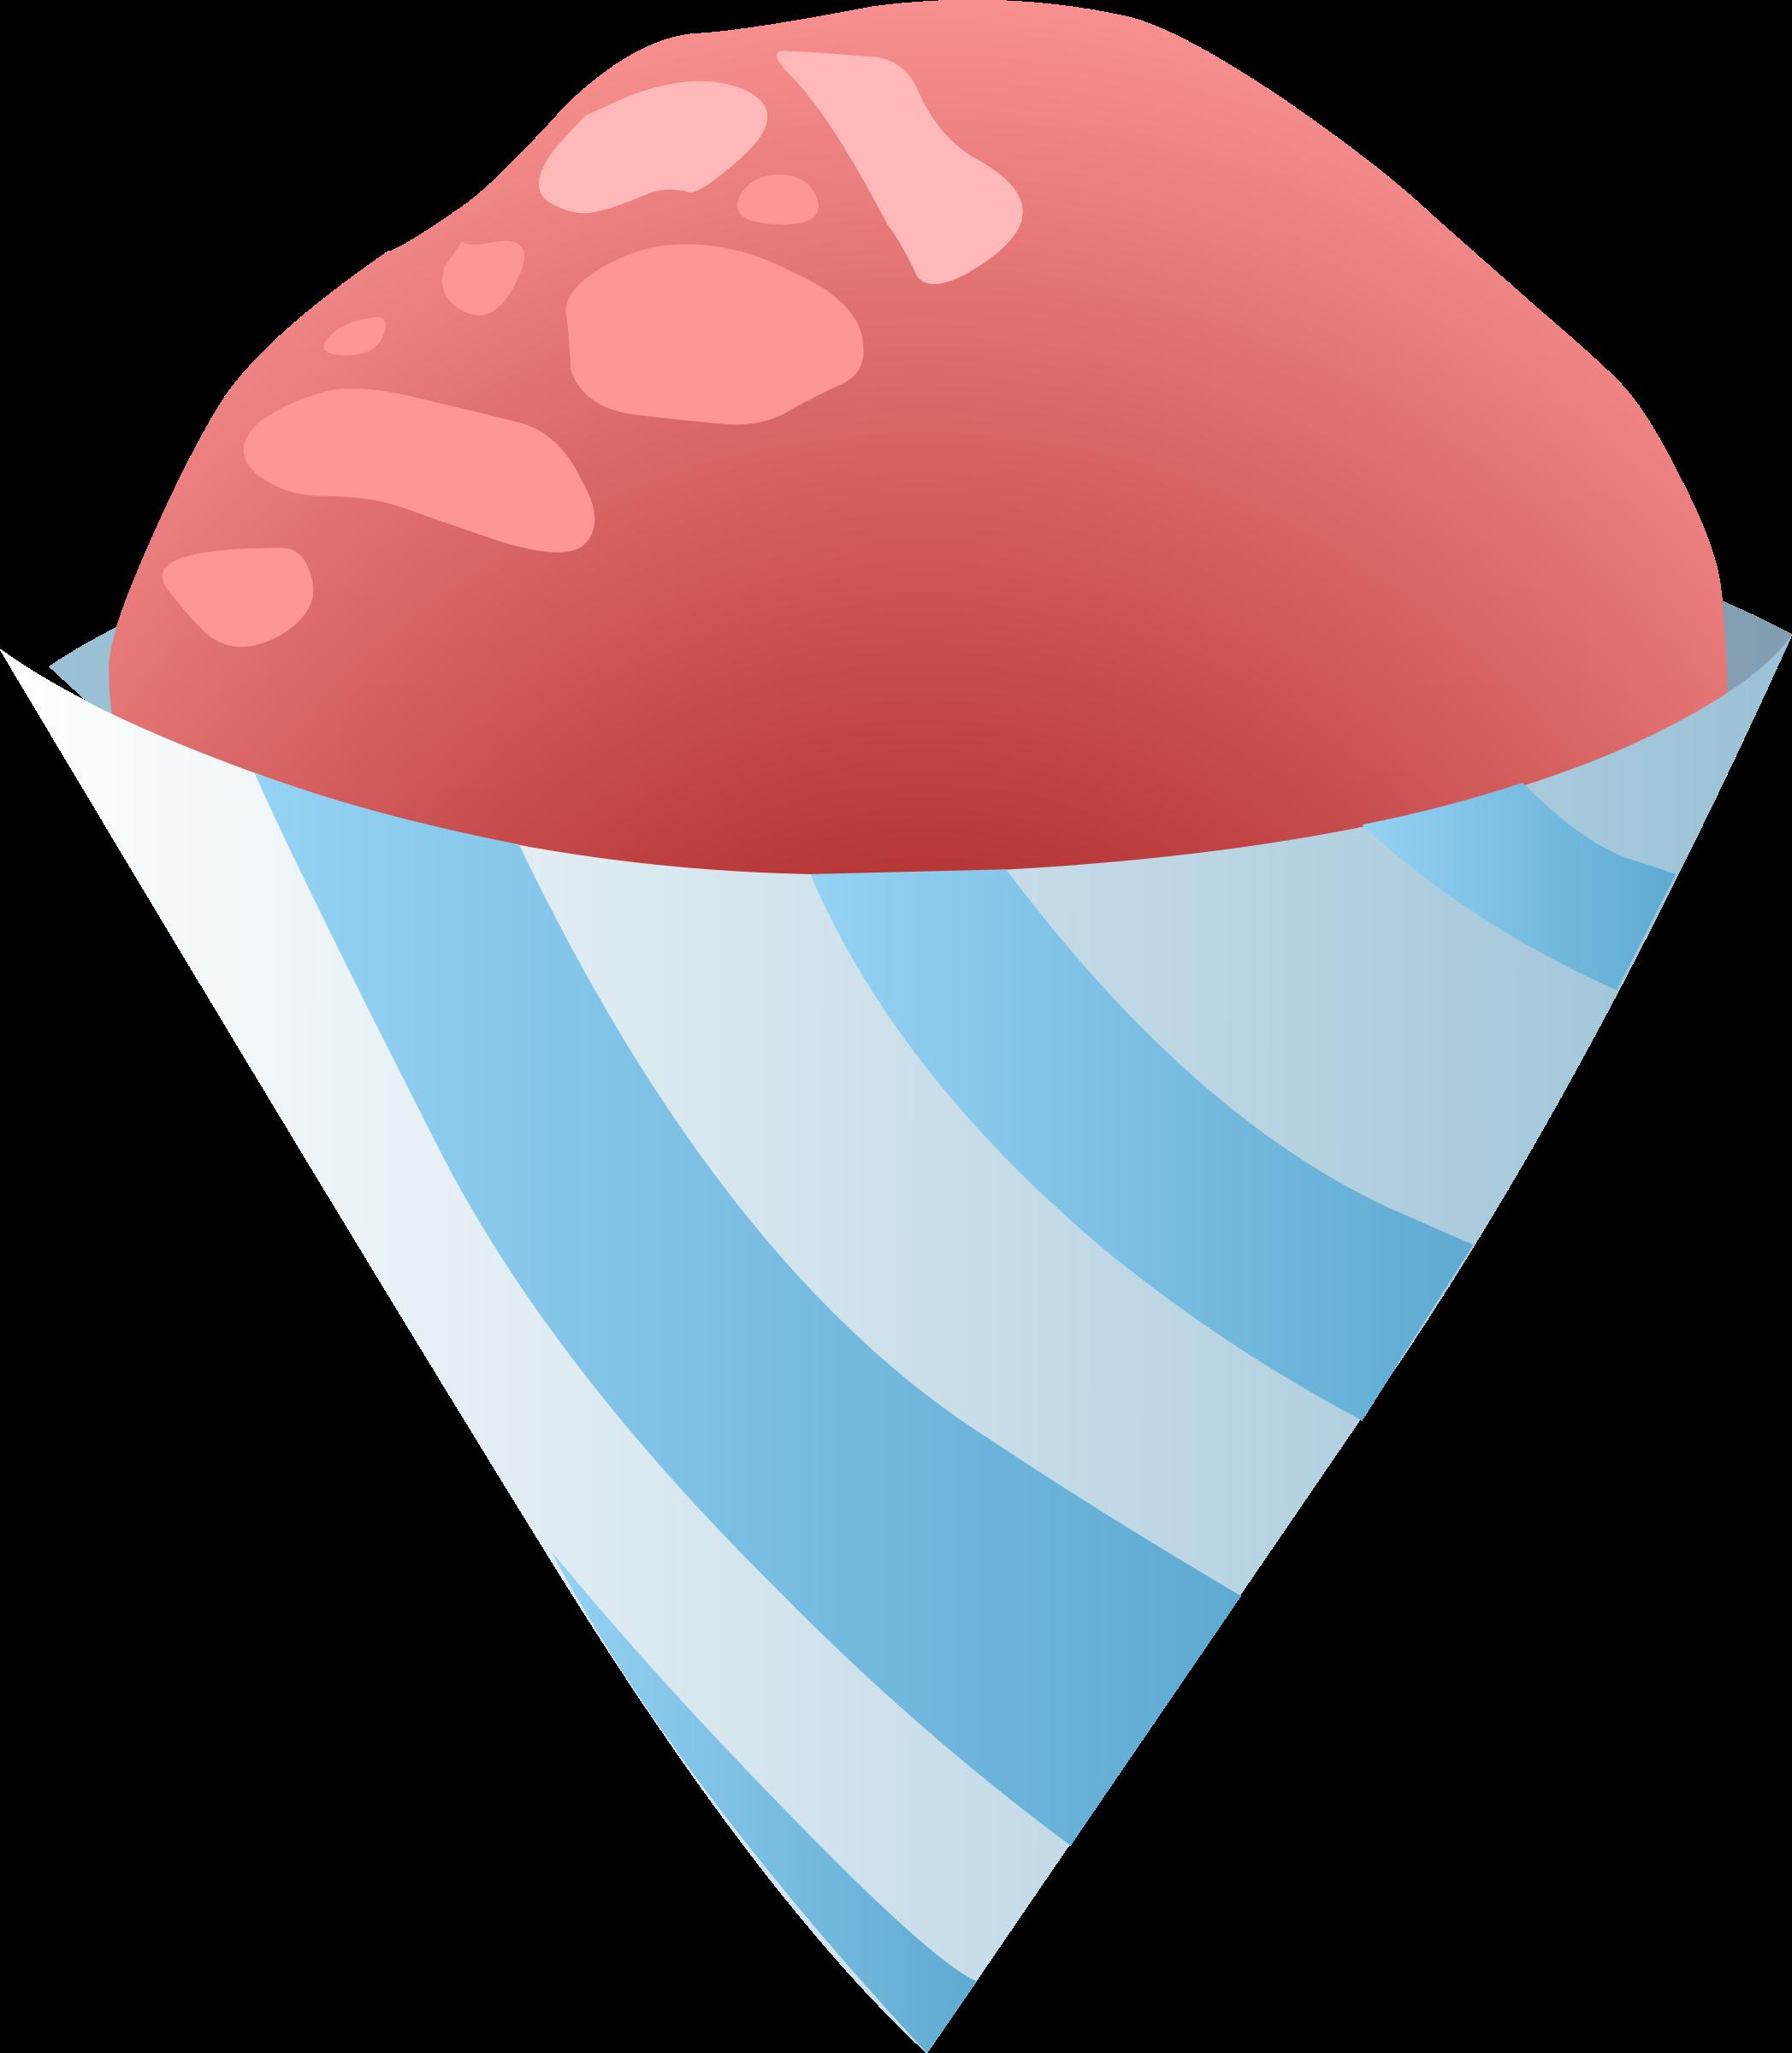 https://0901.nccdn.net/4_2/000/000/056/7dc/food-sno-cone-red-2095x2400.png